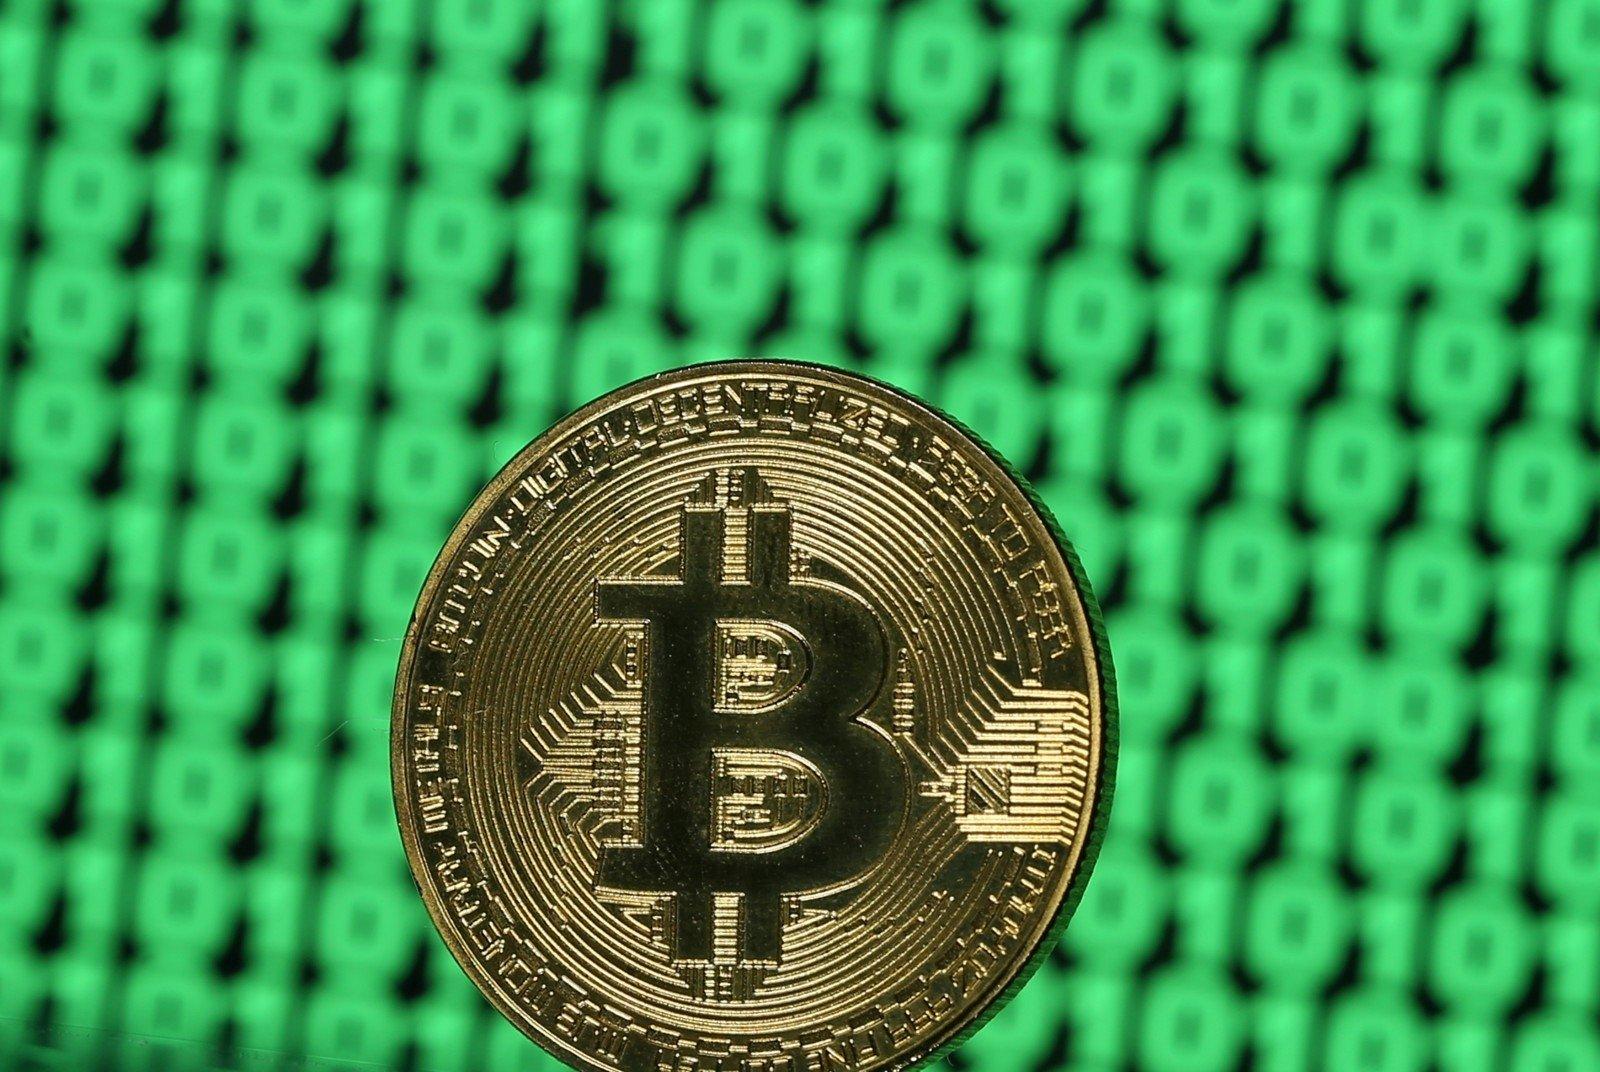 investuoti kriptovaliut turint maai pinig)